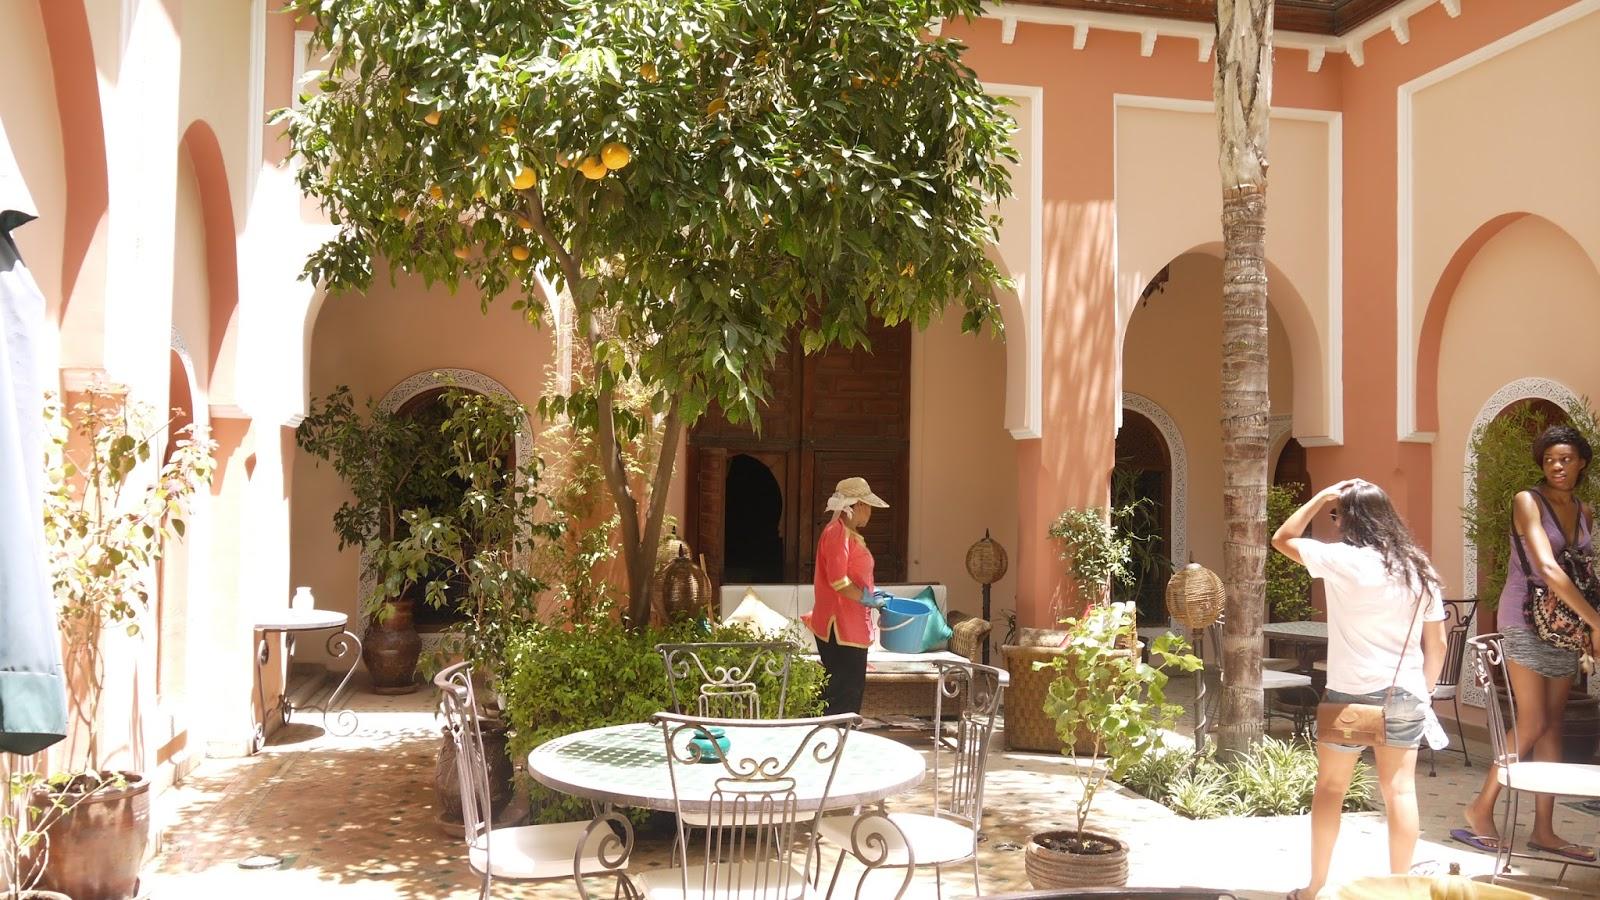 La Mode D'Emm Marrakech, Morocco